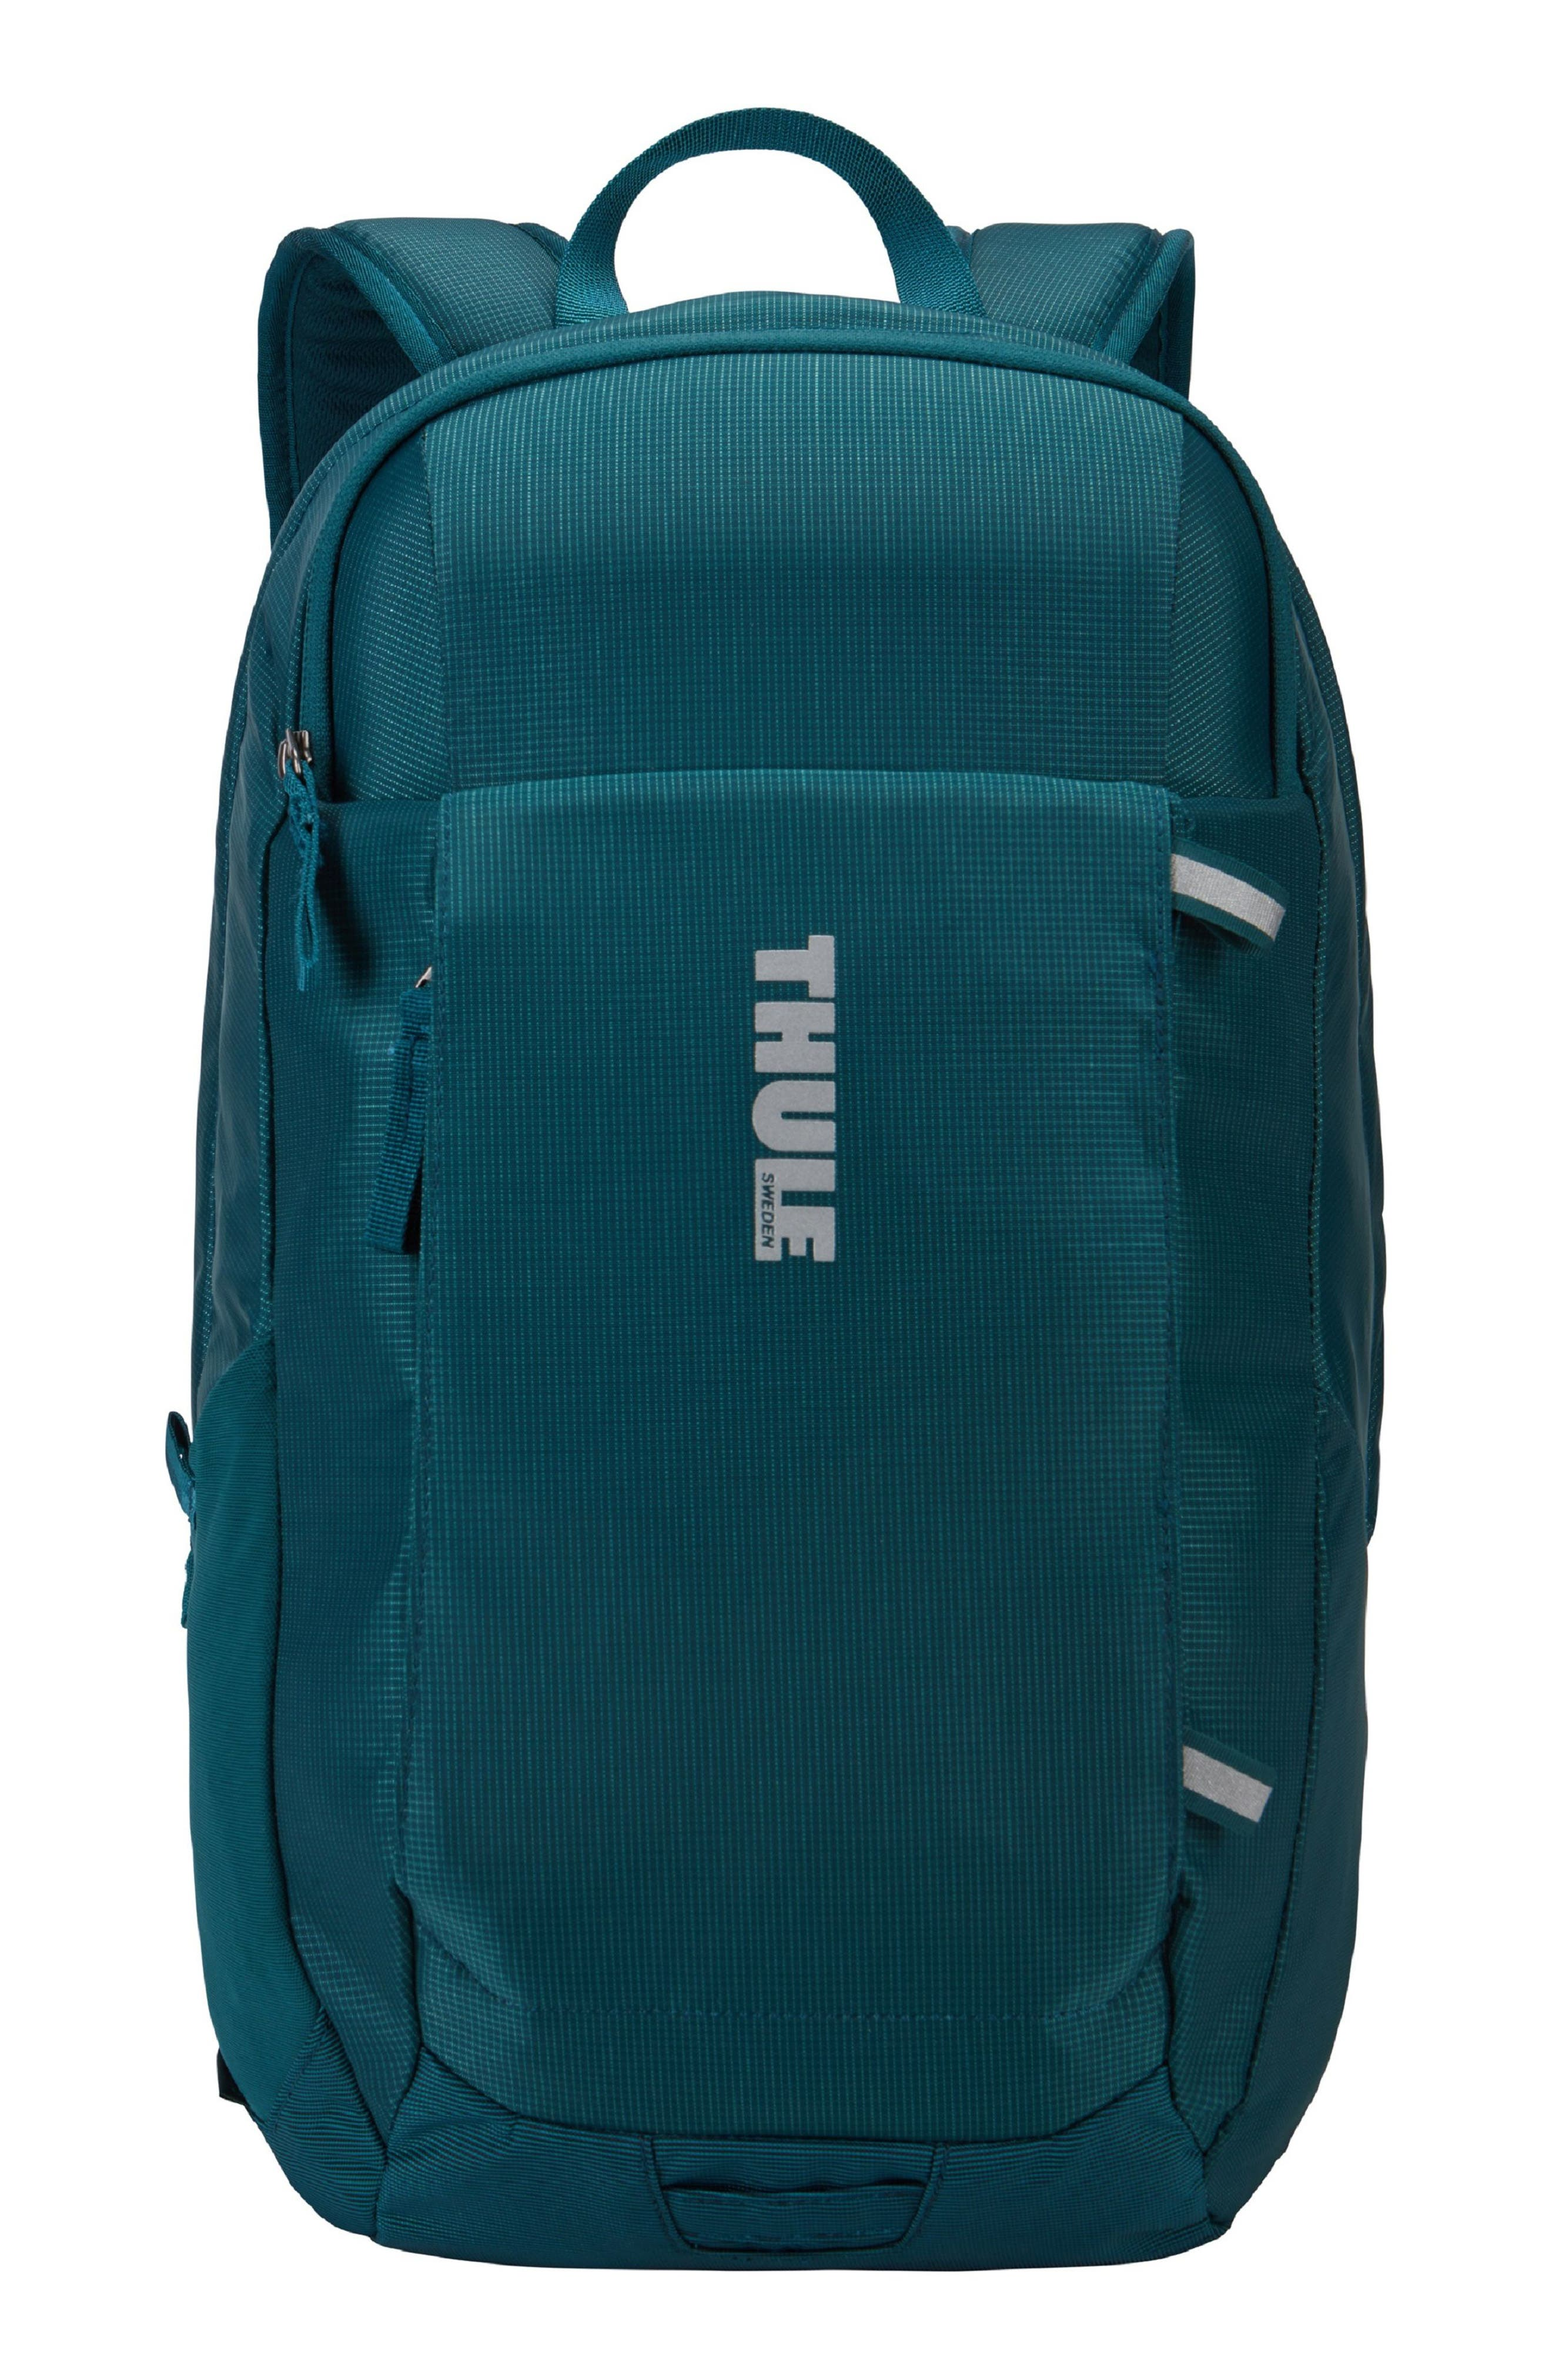 Thule EnRoute Backpack (18L)